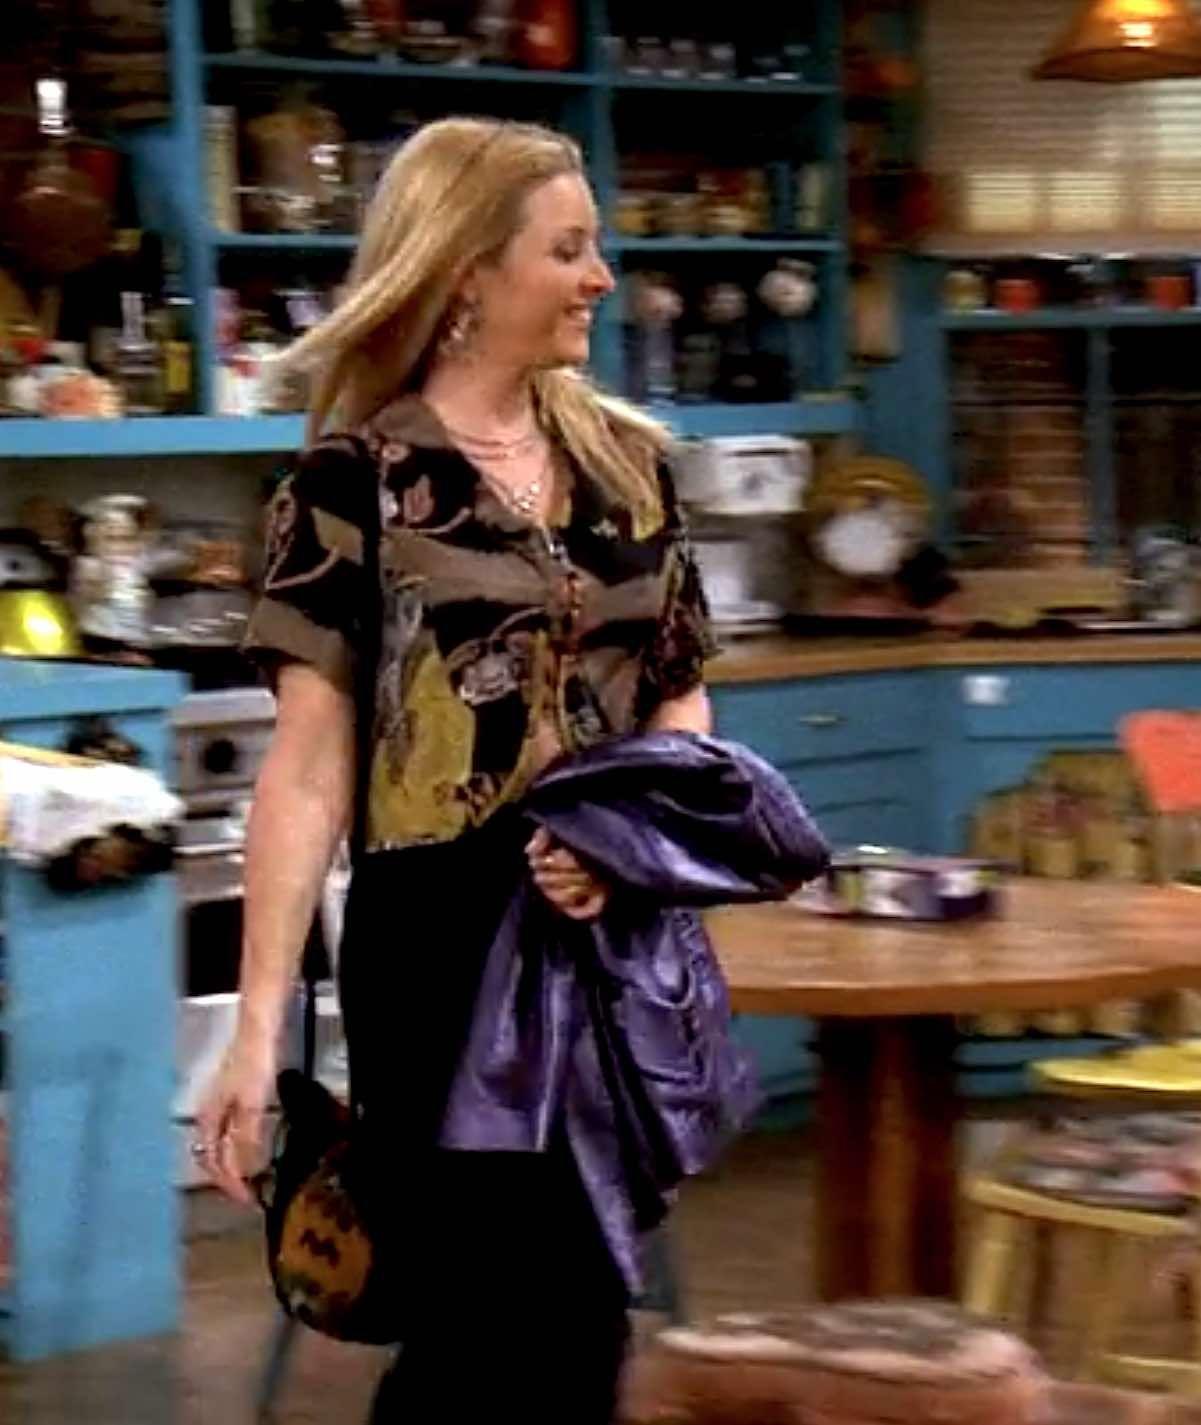 656 Outfits Phoebe Buffay Wore On Friends Fashion Paradoxes Phoebe Buffay Outfits Fashion Friends Fashion [ 1425 x 1201 Pixel ]